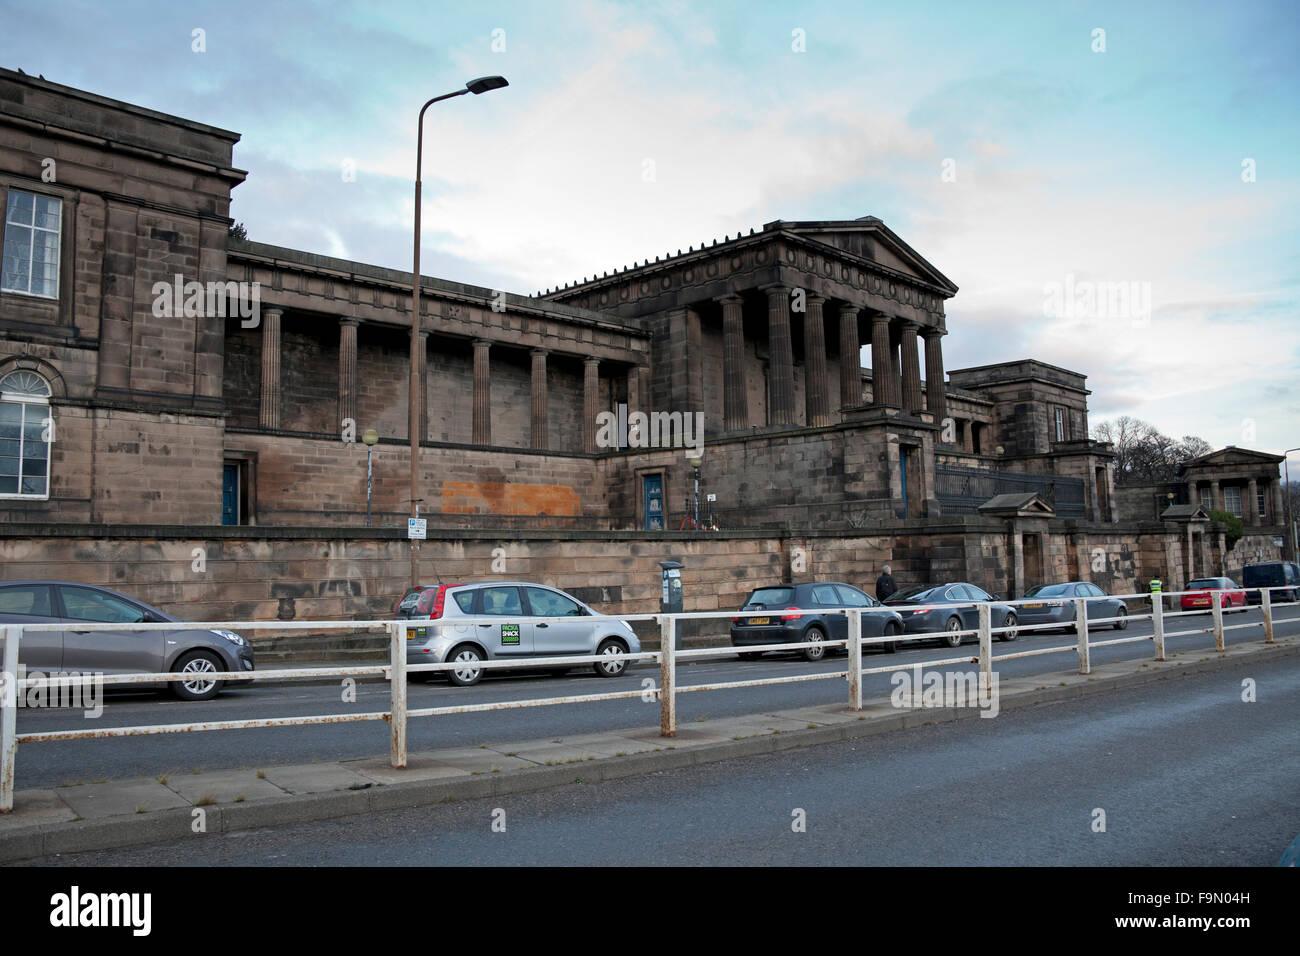 Edinburgh, Scotland, UK, 17 Dec. 2015  Edinburgh Councillors have rejected plans to turn the former Royal High School - Stock Image